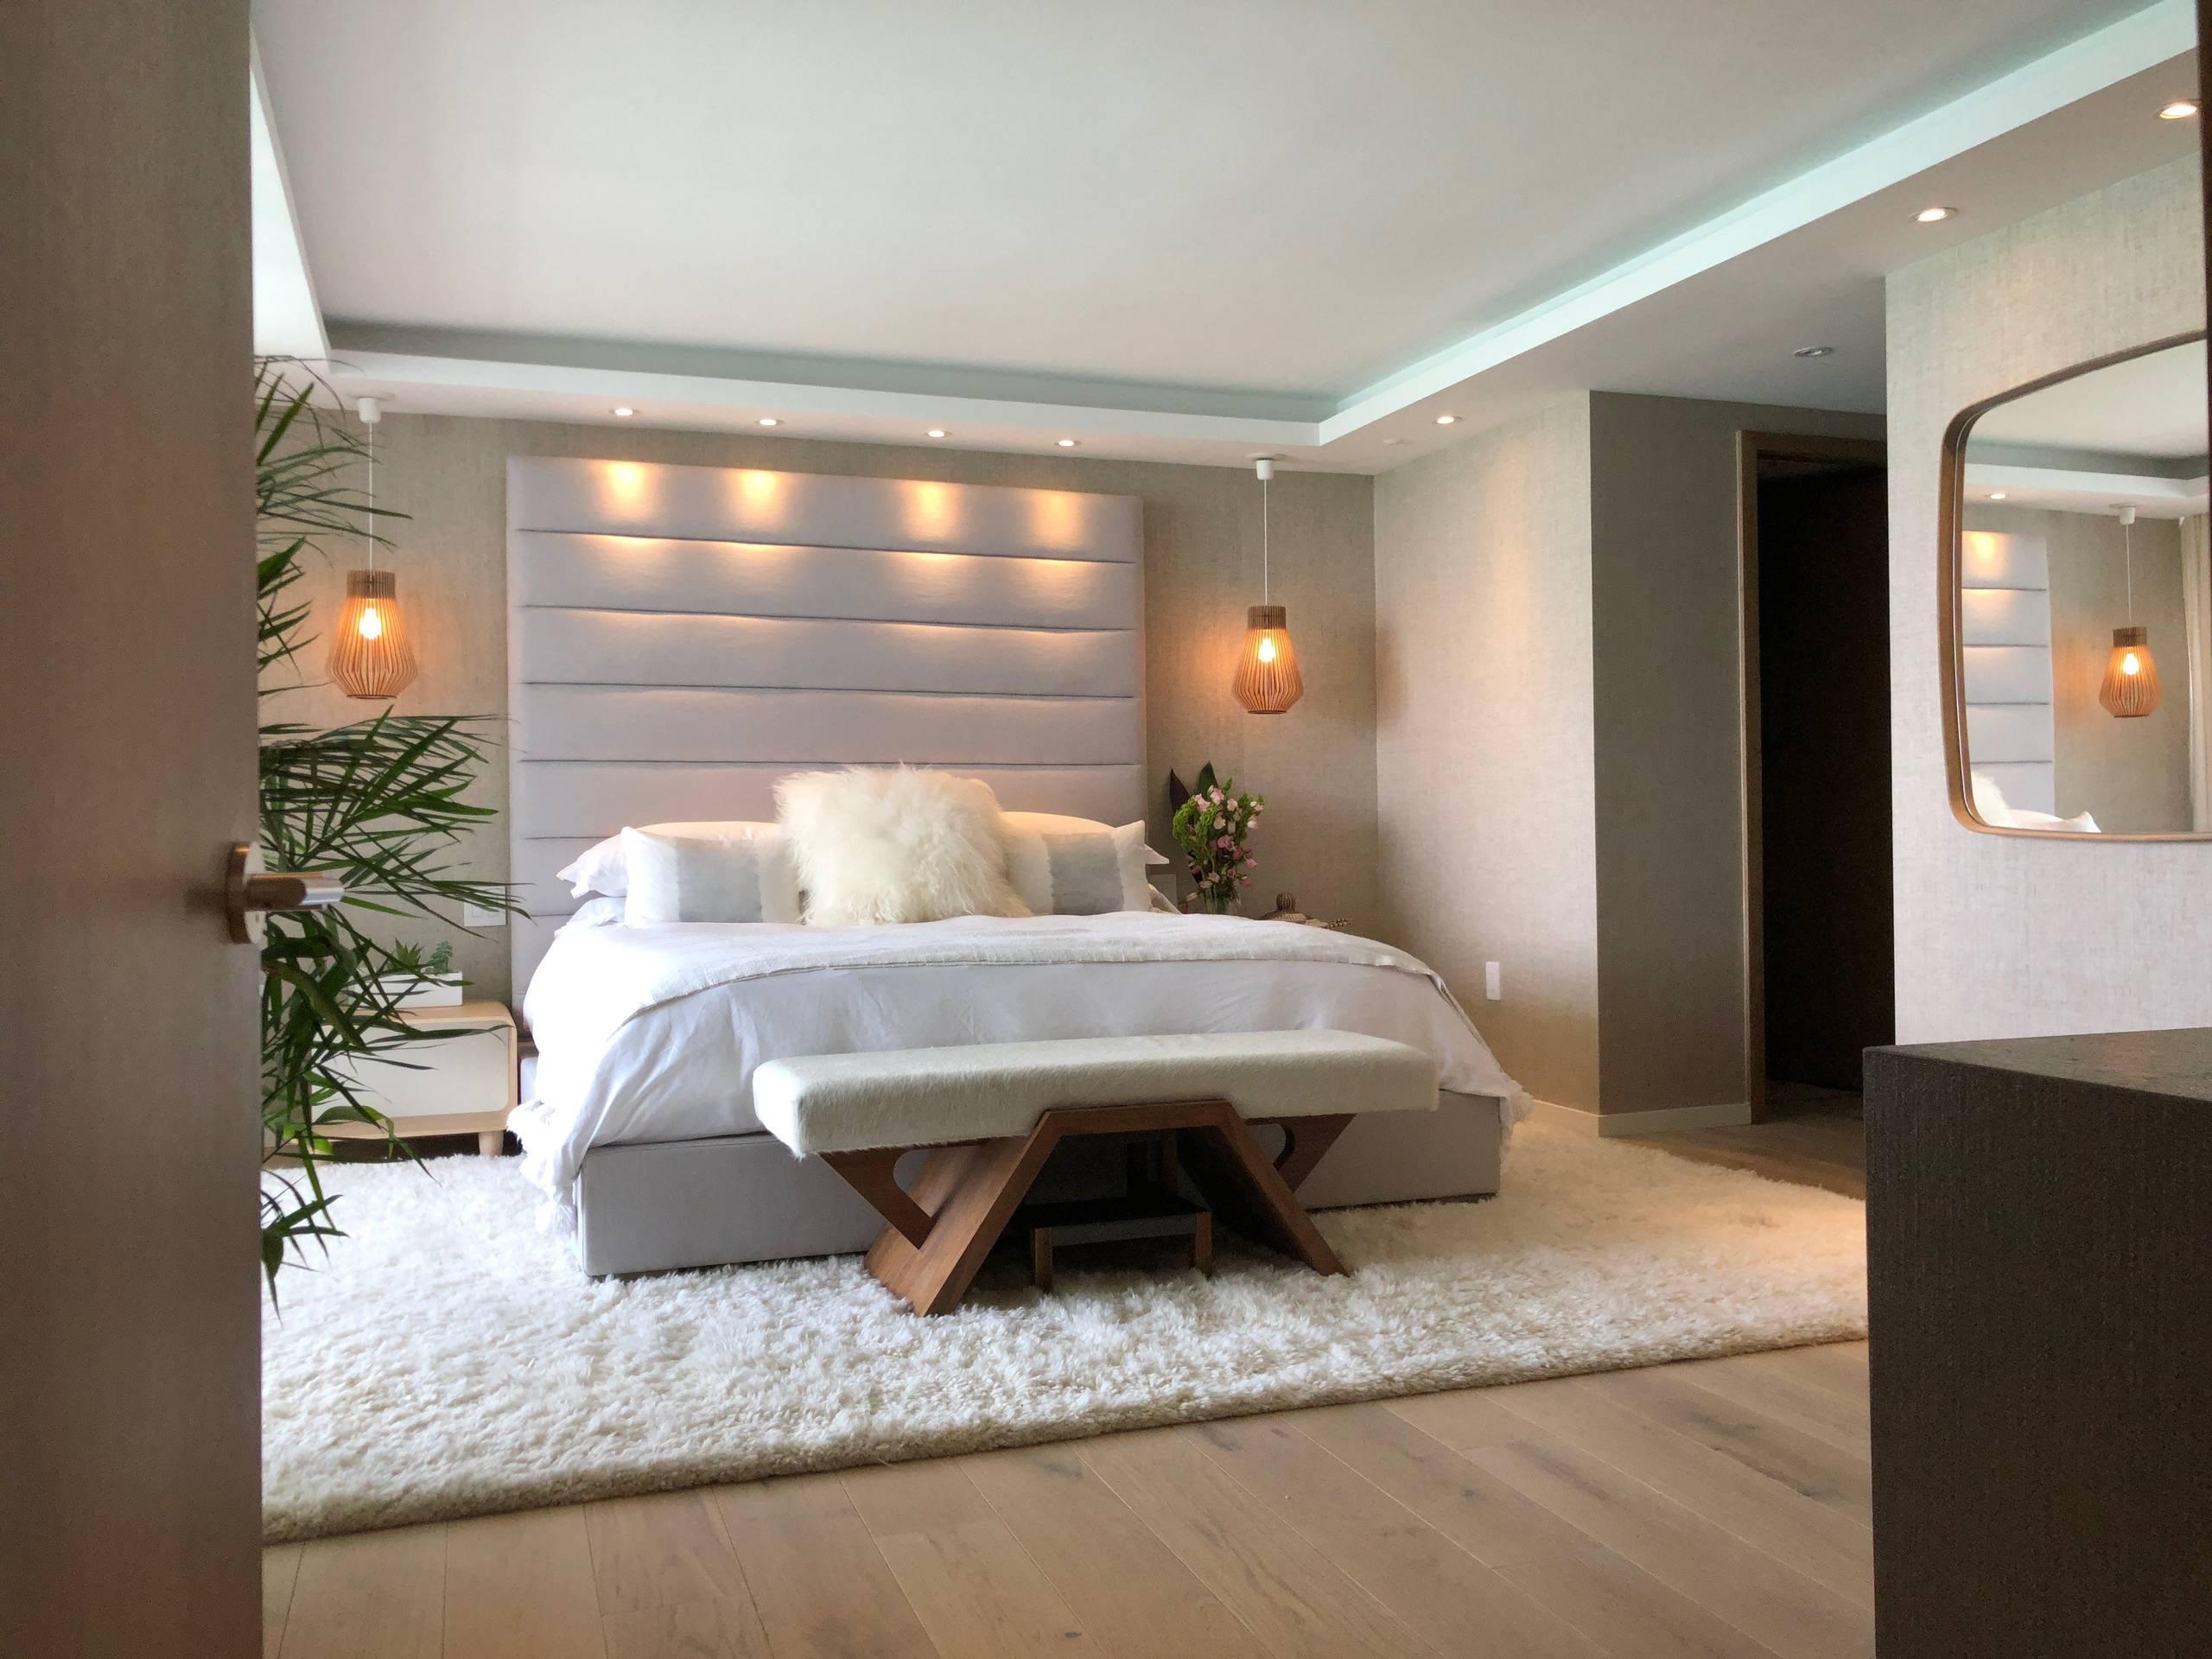 75 Beautiful Modern Bedroom Pictures Ideas October 2020 Houzz